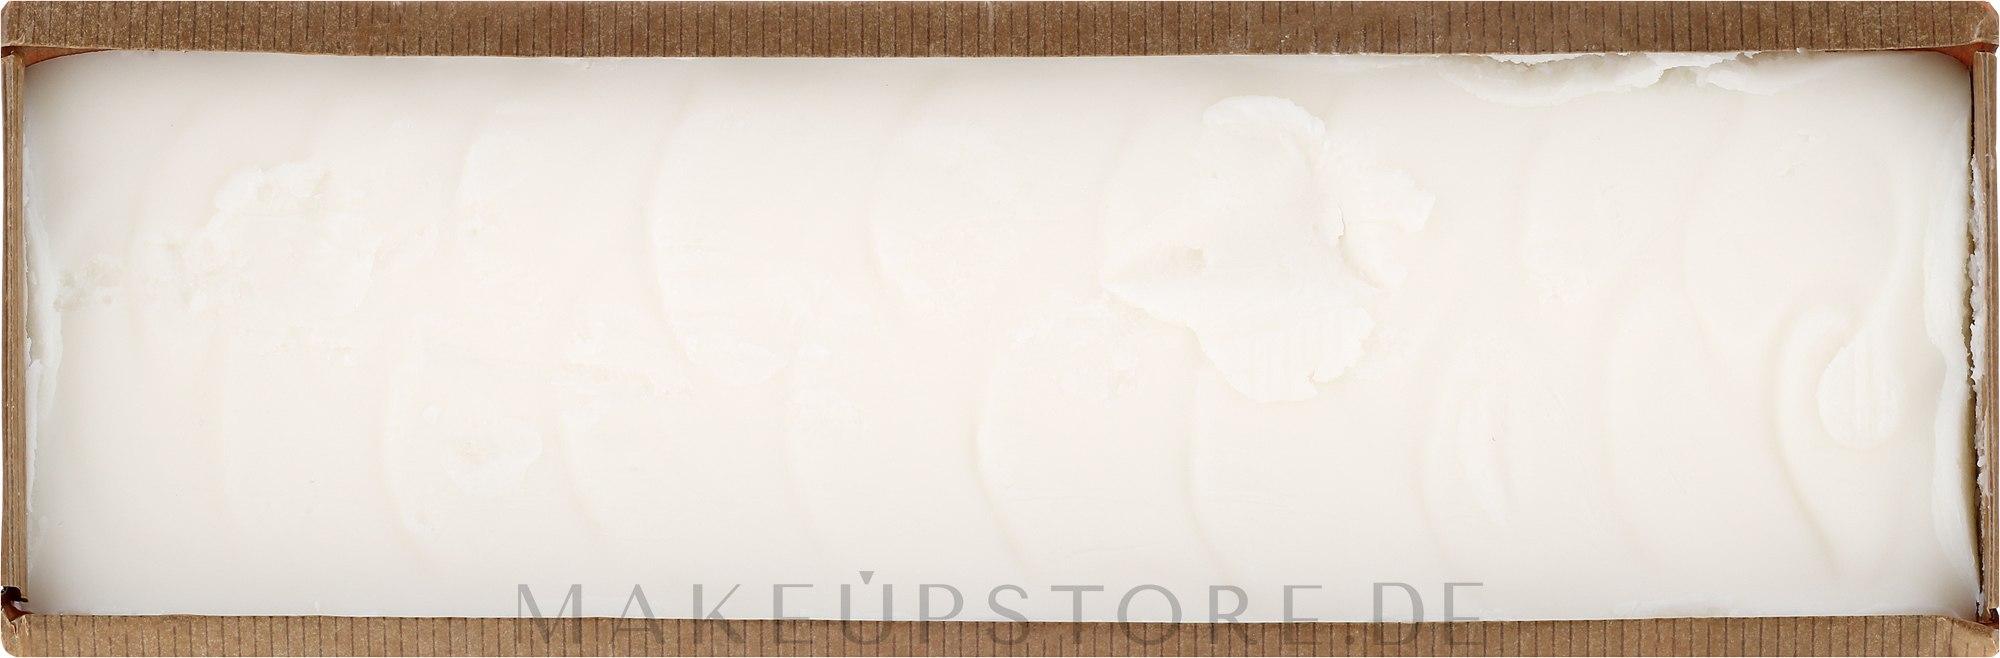 Körperbalsam Weiße Blumen - E-Fiore Natural Body Balm — Bild 700 g